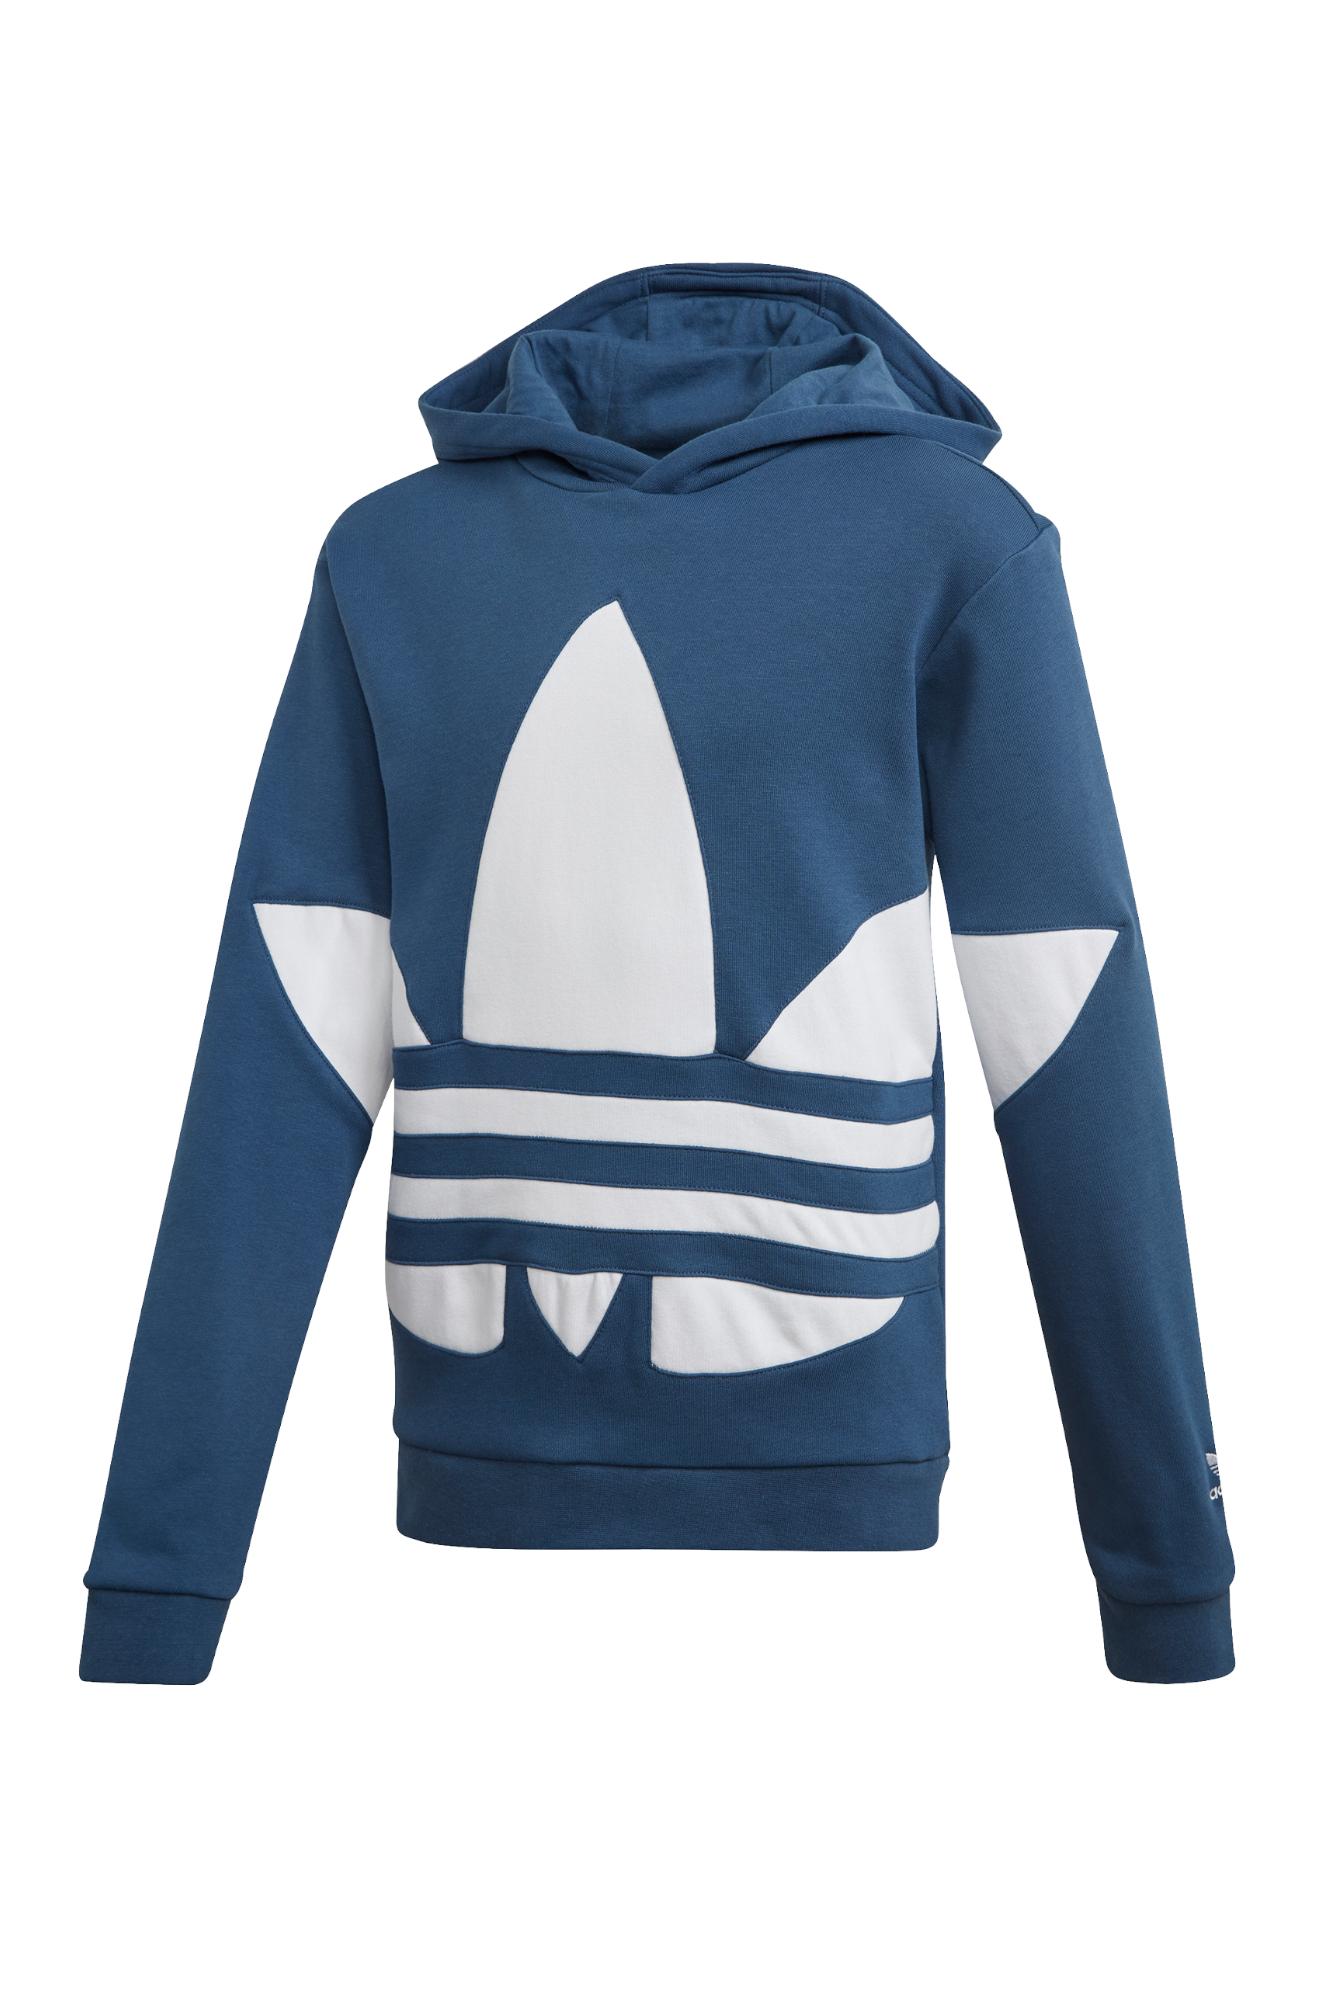 Bluza adidas Originals Big Trefoil FS1855 BluzyPolary